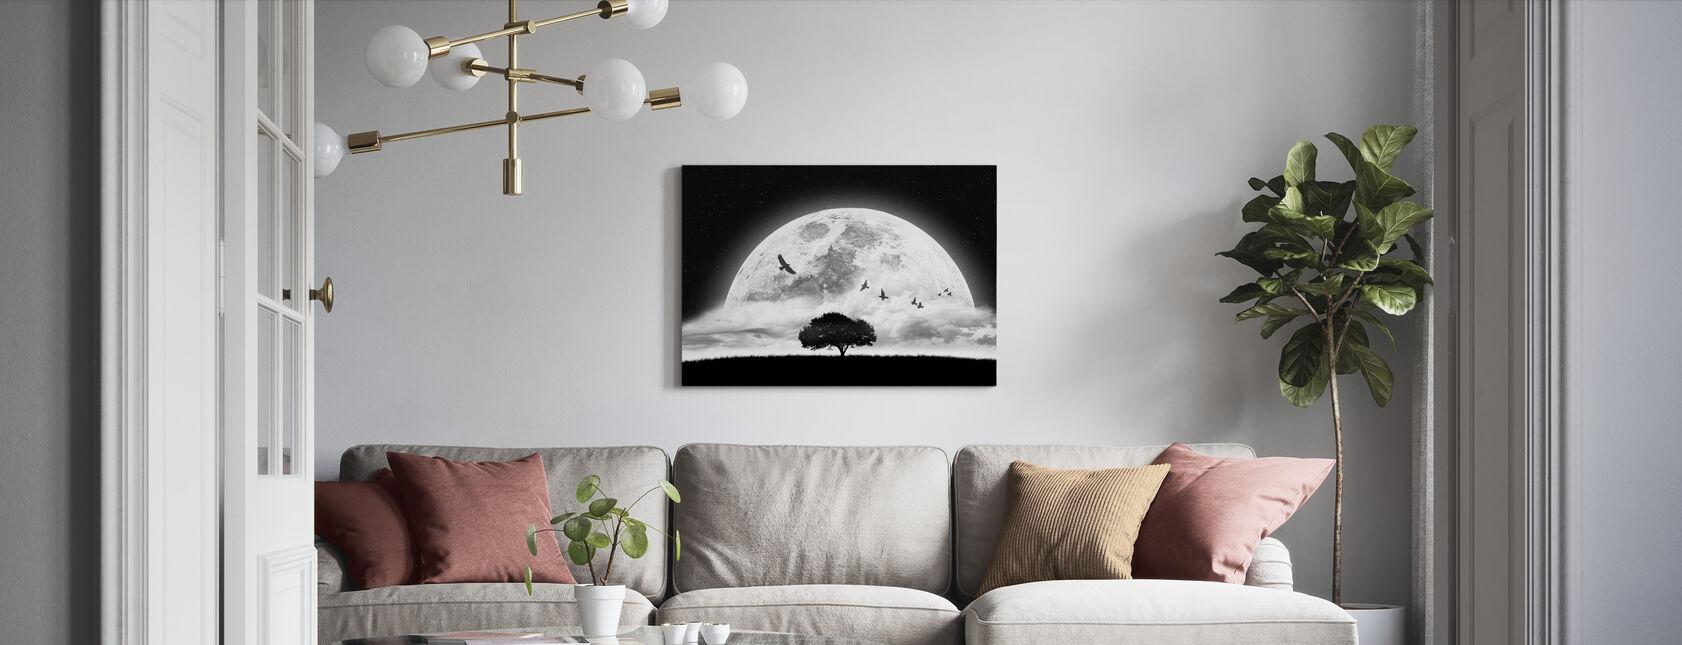 Unelma - Canvastaulu - Olohuone